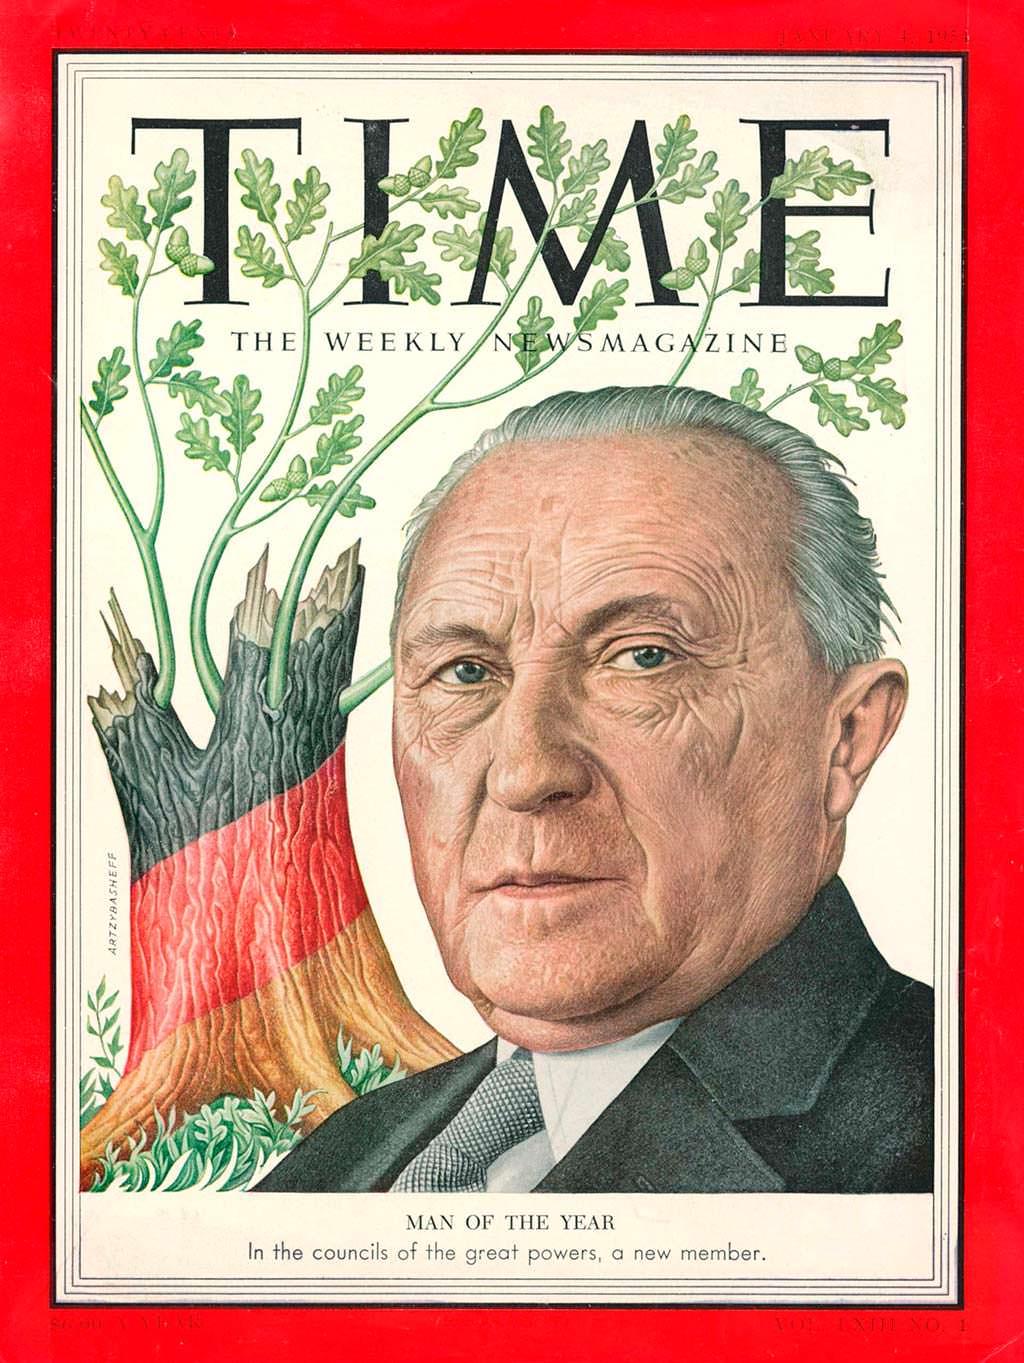 1953 год. Канцлер ФРГ Конрад Аденауэр на обложке Time